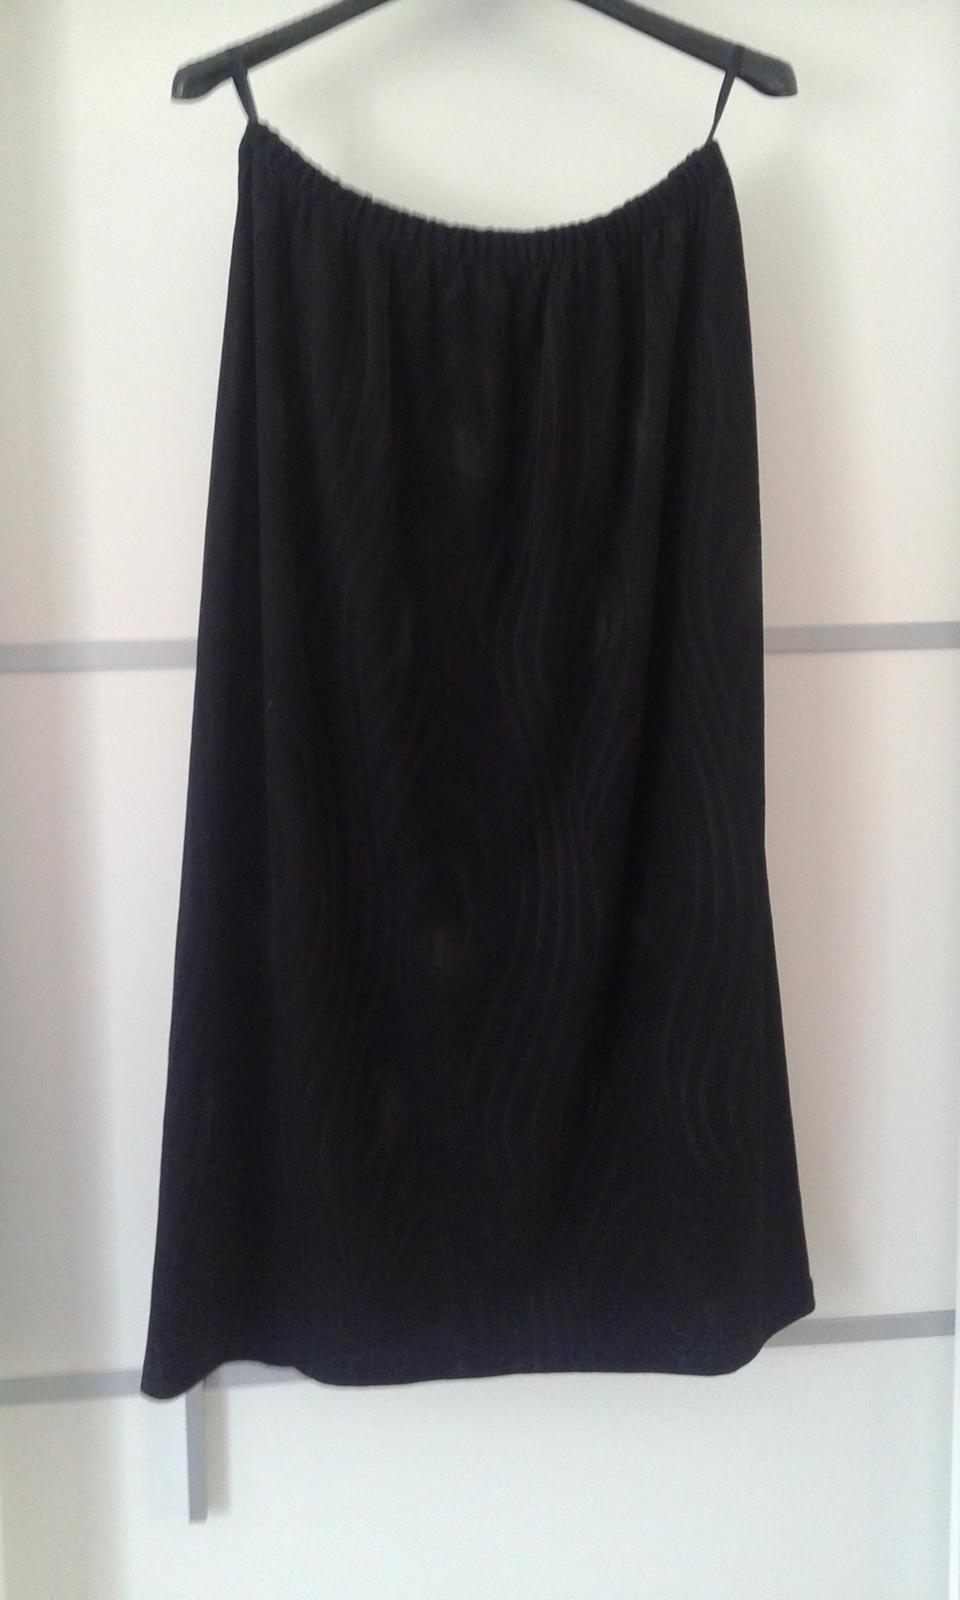 Čierny kostým - kabátik, top a sukňa č.L - Obrázok č. 4